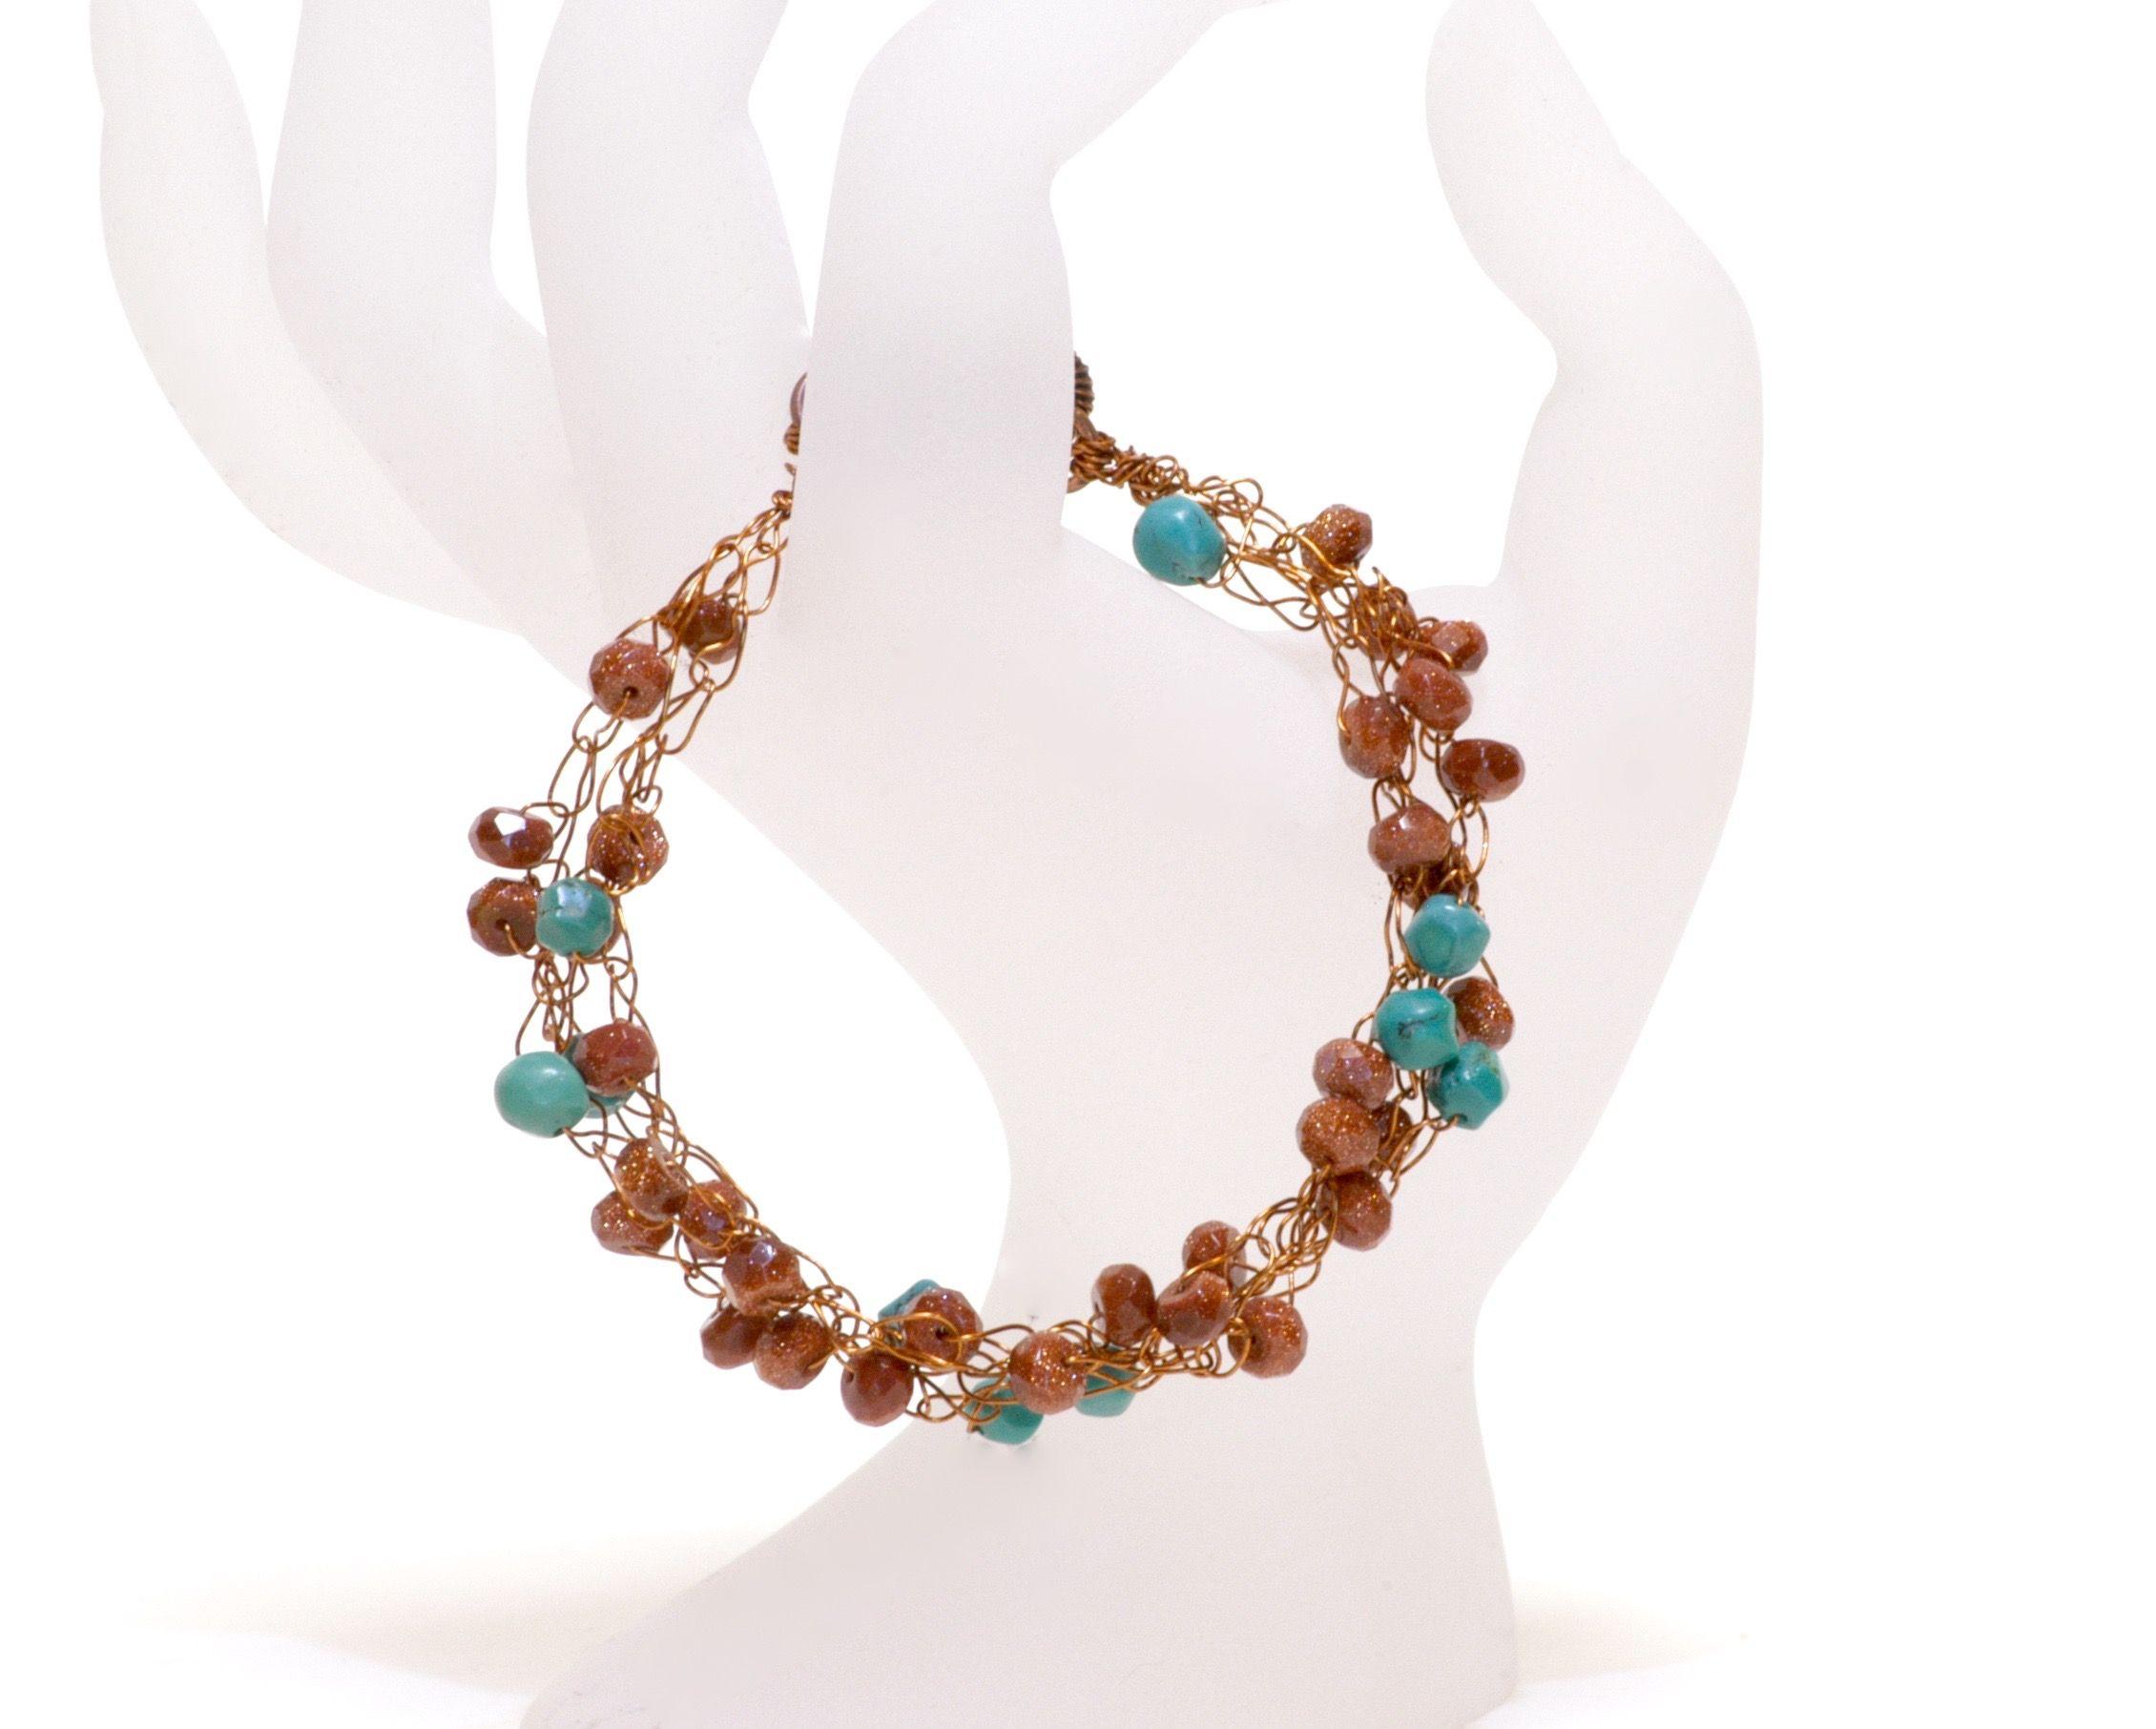 Copper Wire Crochet Bracelet | Jewelry I make | Pinterest | Handmade ...